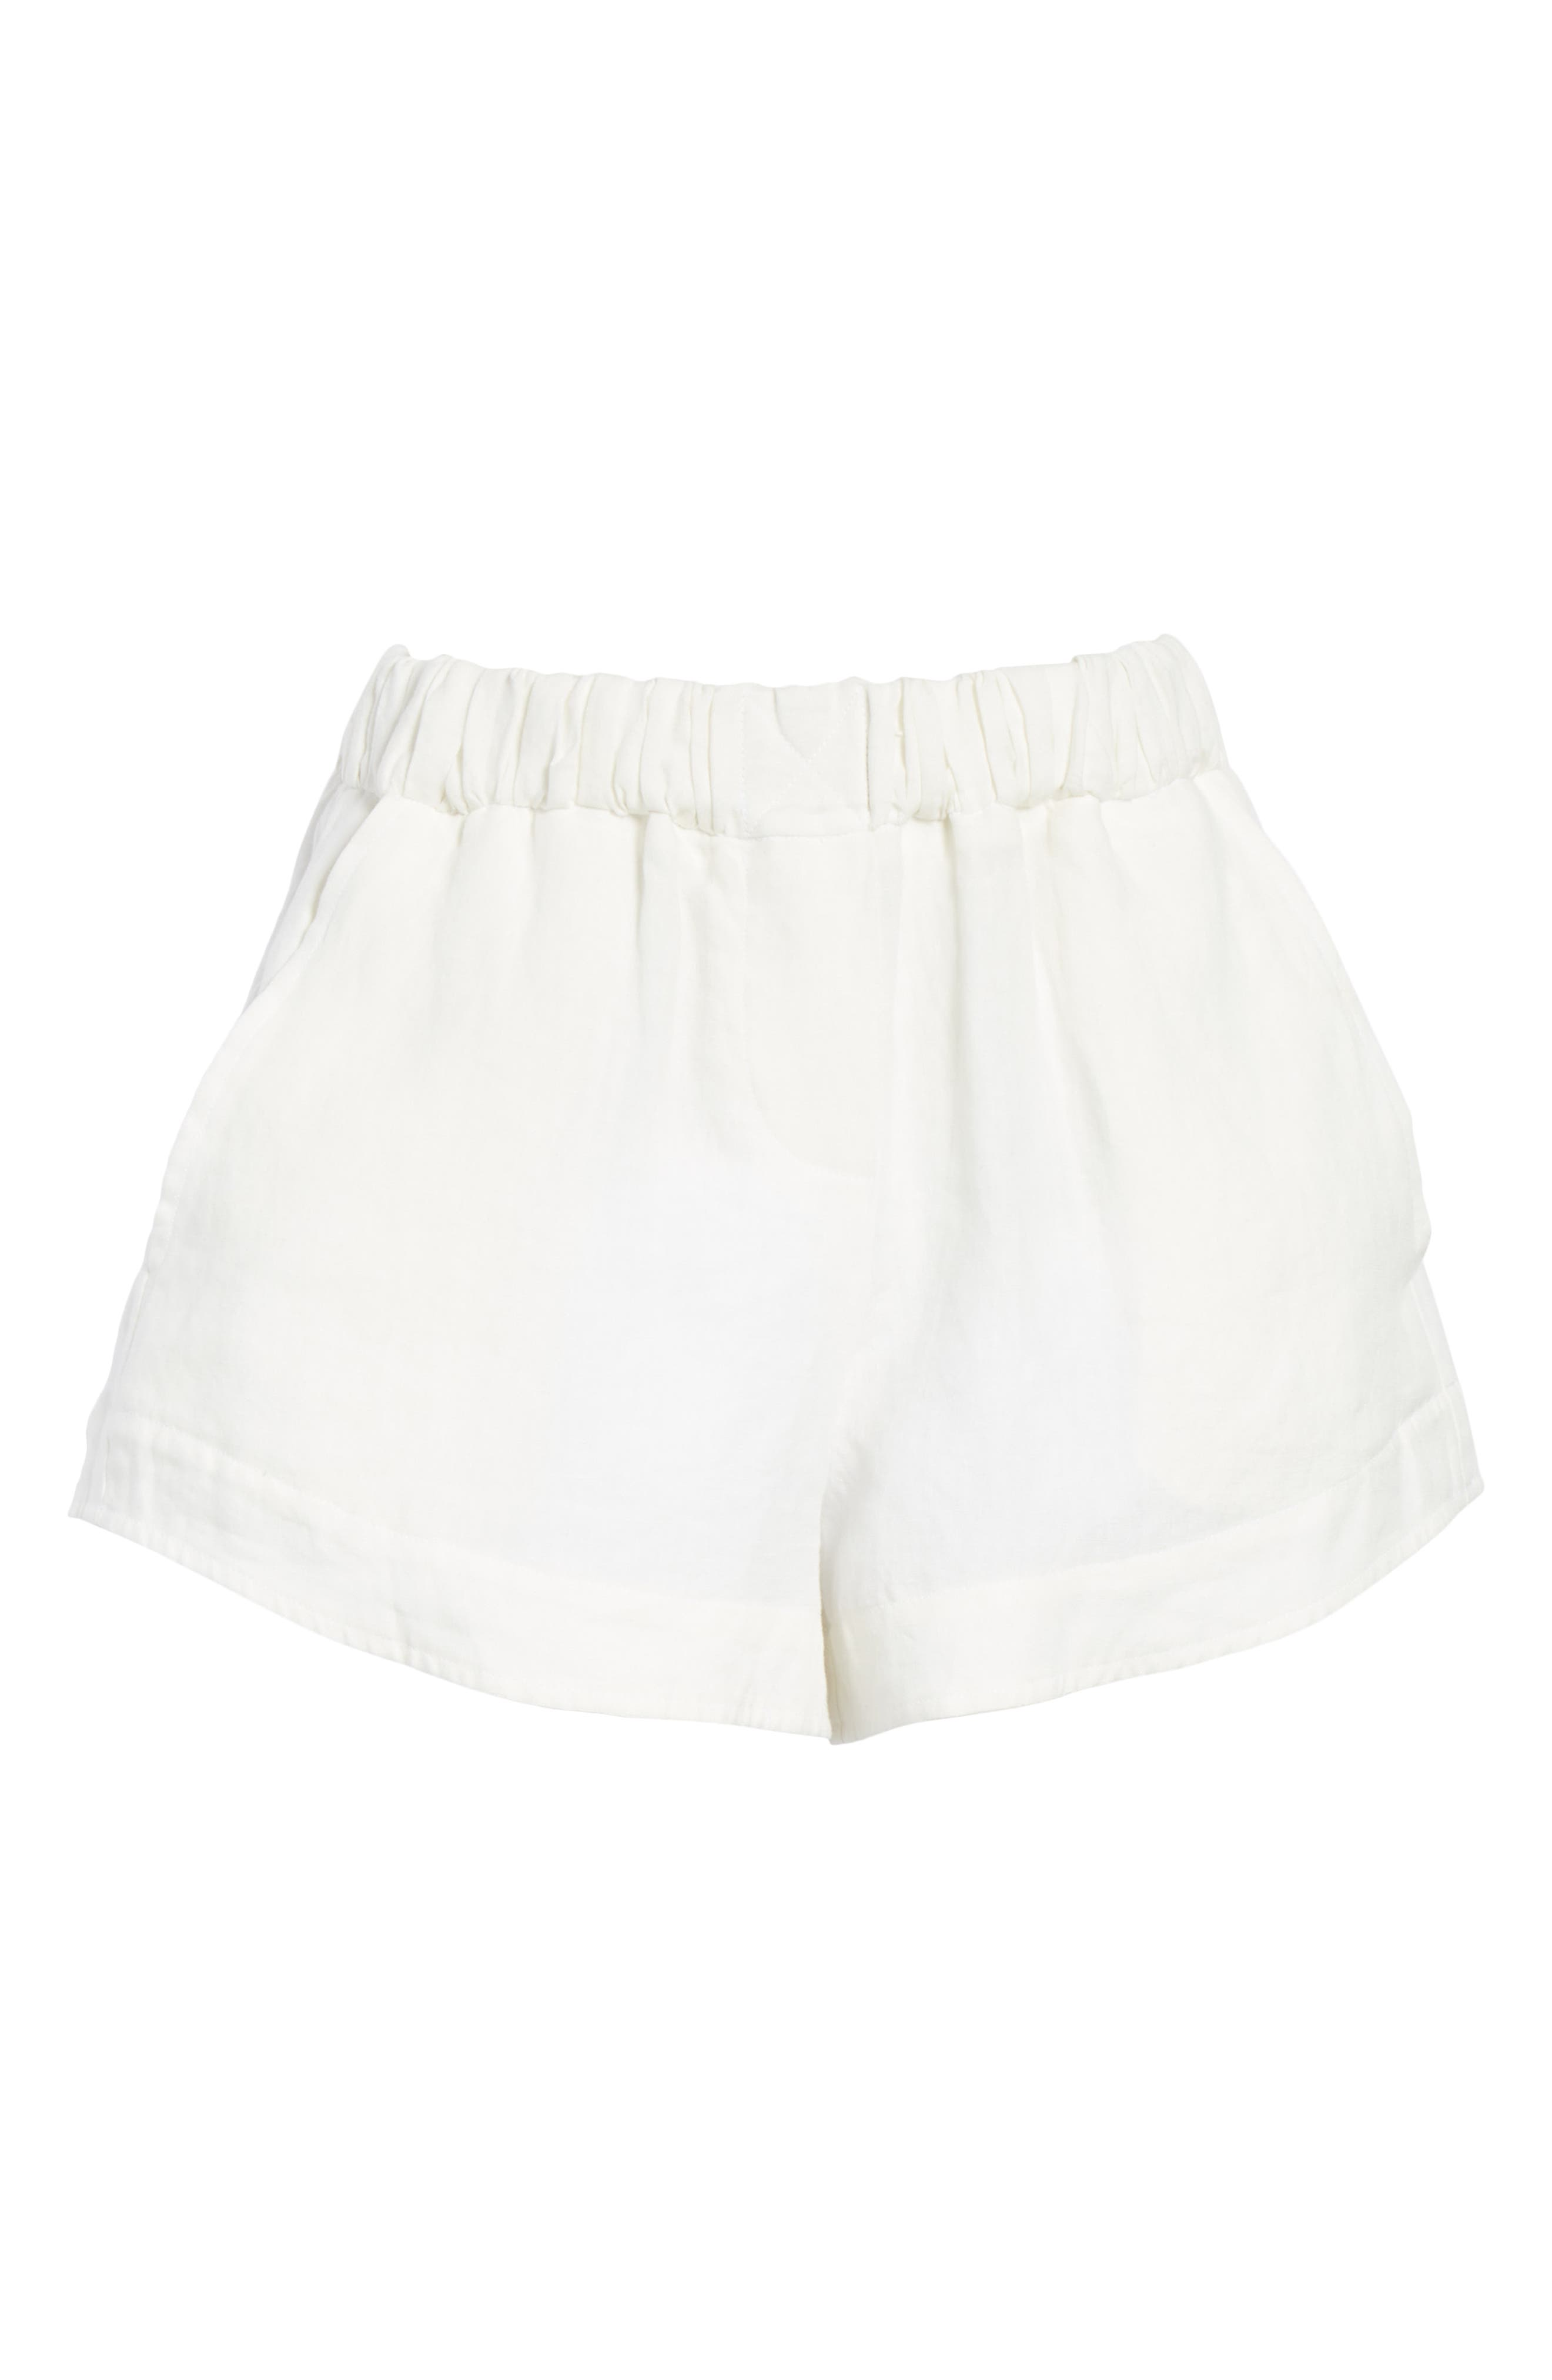 Nyssa Linen Shorts,                             Alternate thumbnail 7, color,                             IVORY